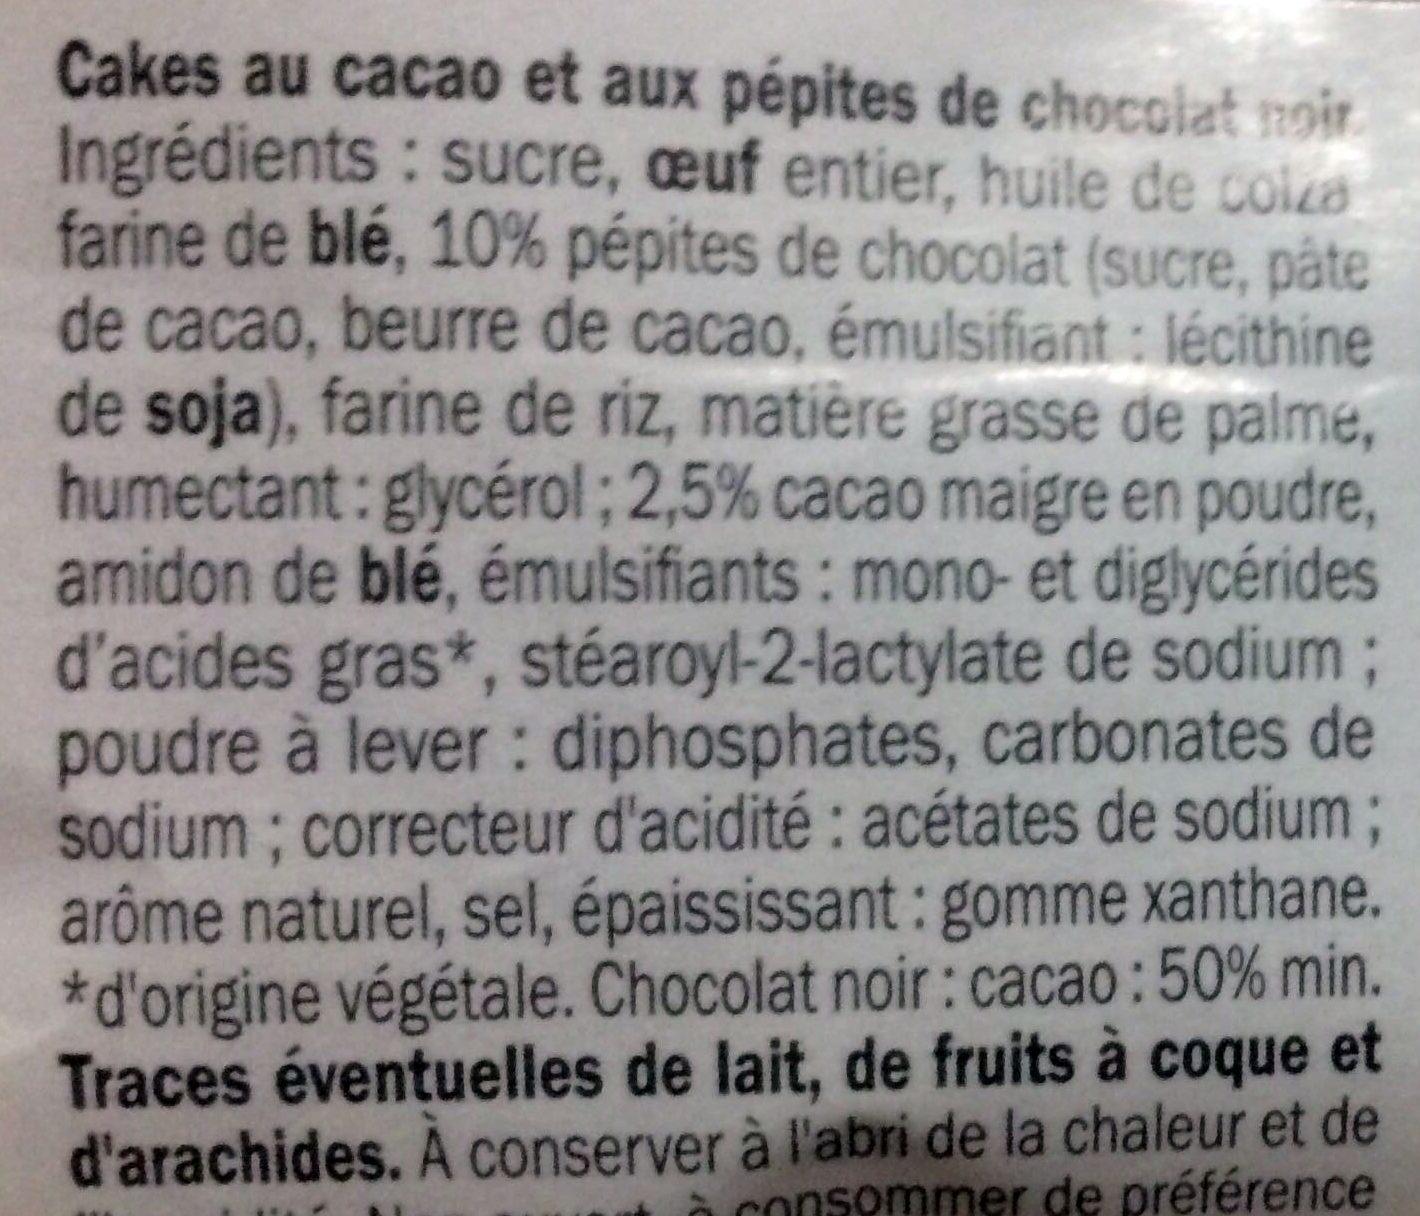 Muffins Double Choc - Ingrédients - fr